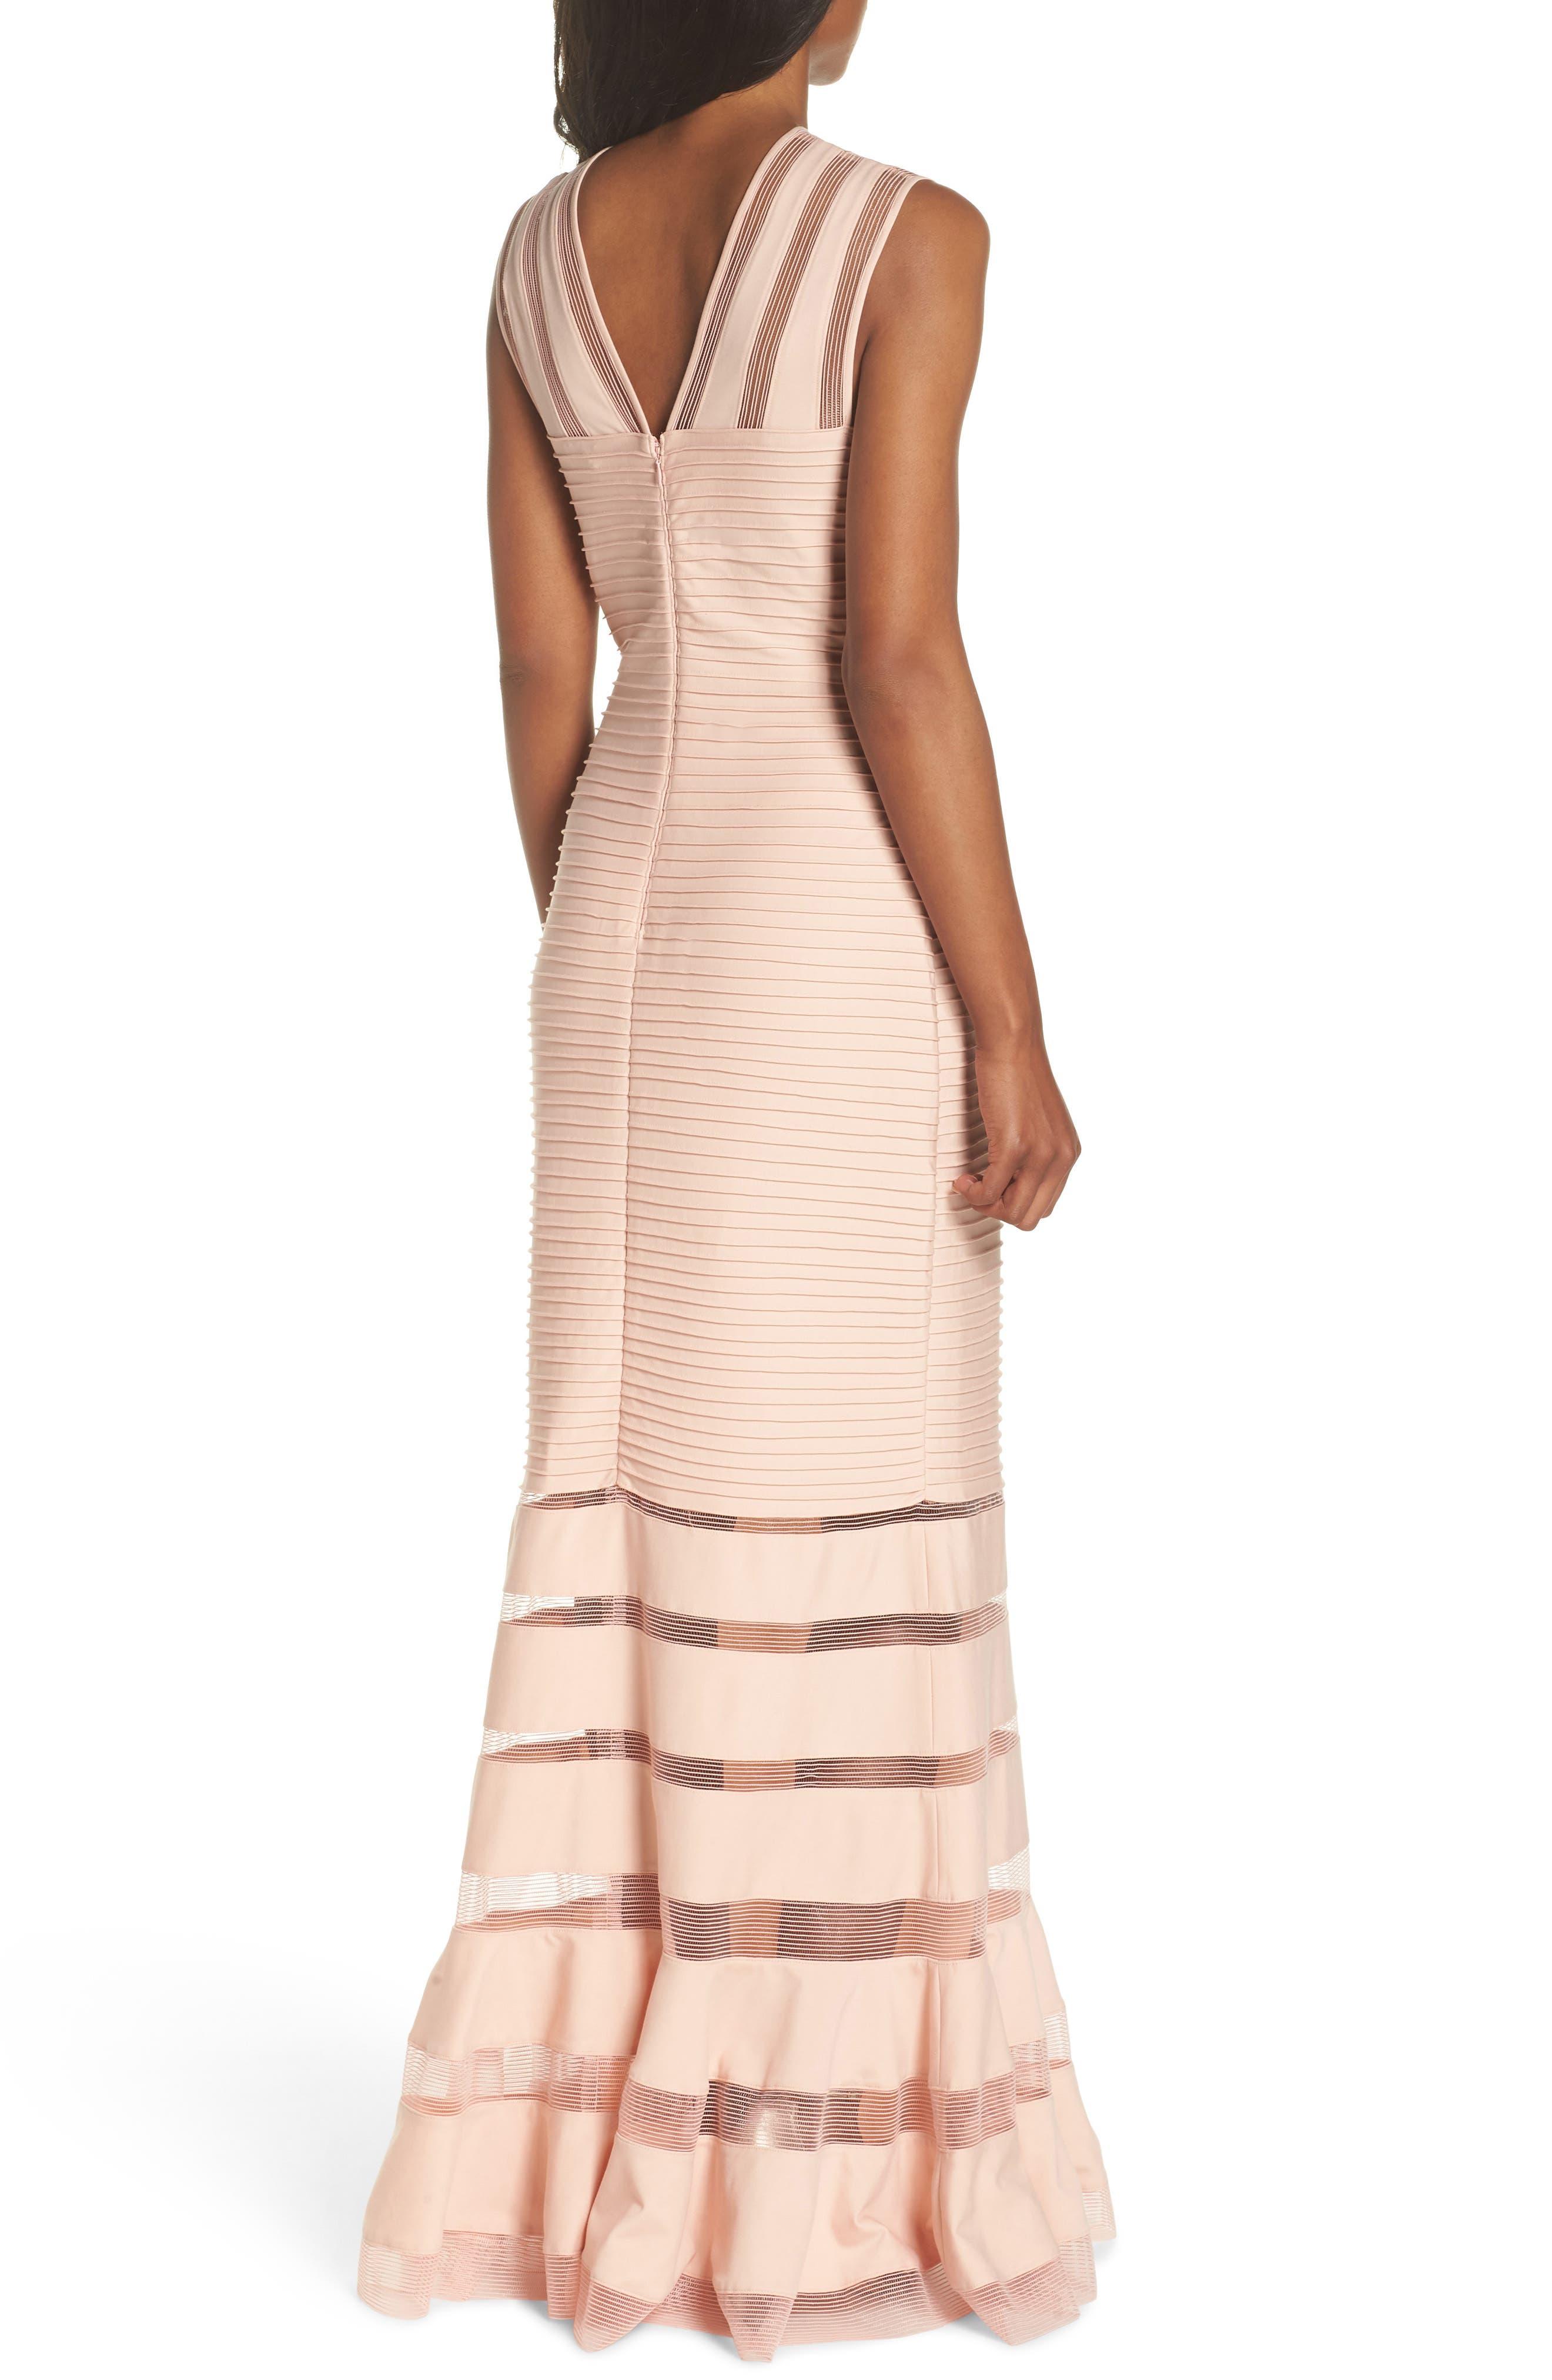 Mesh Inset Pintuck Dress,                             Alternate thumbnail 2, color,                             PETAL/ BLOOM